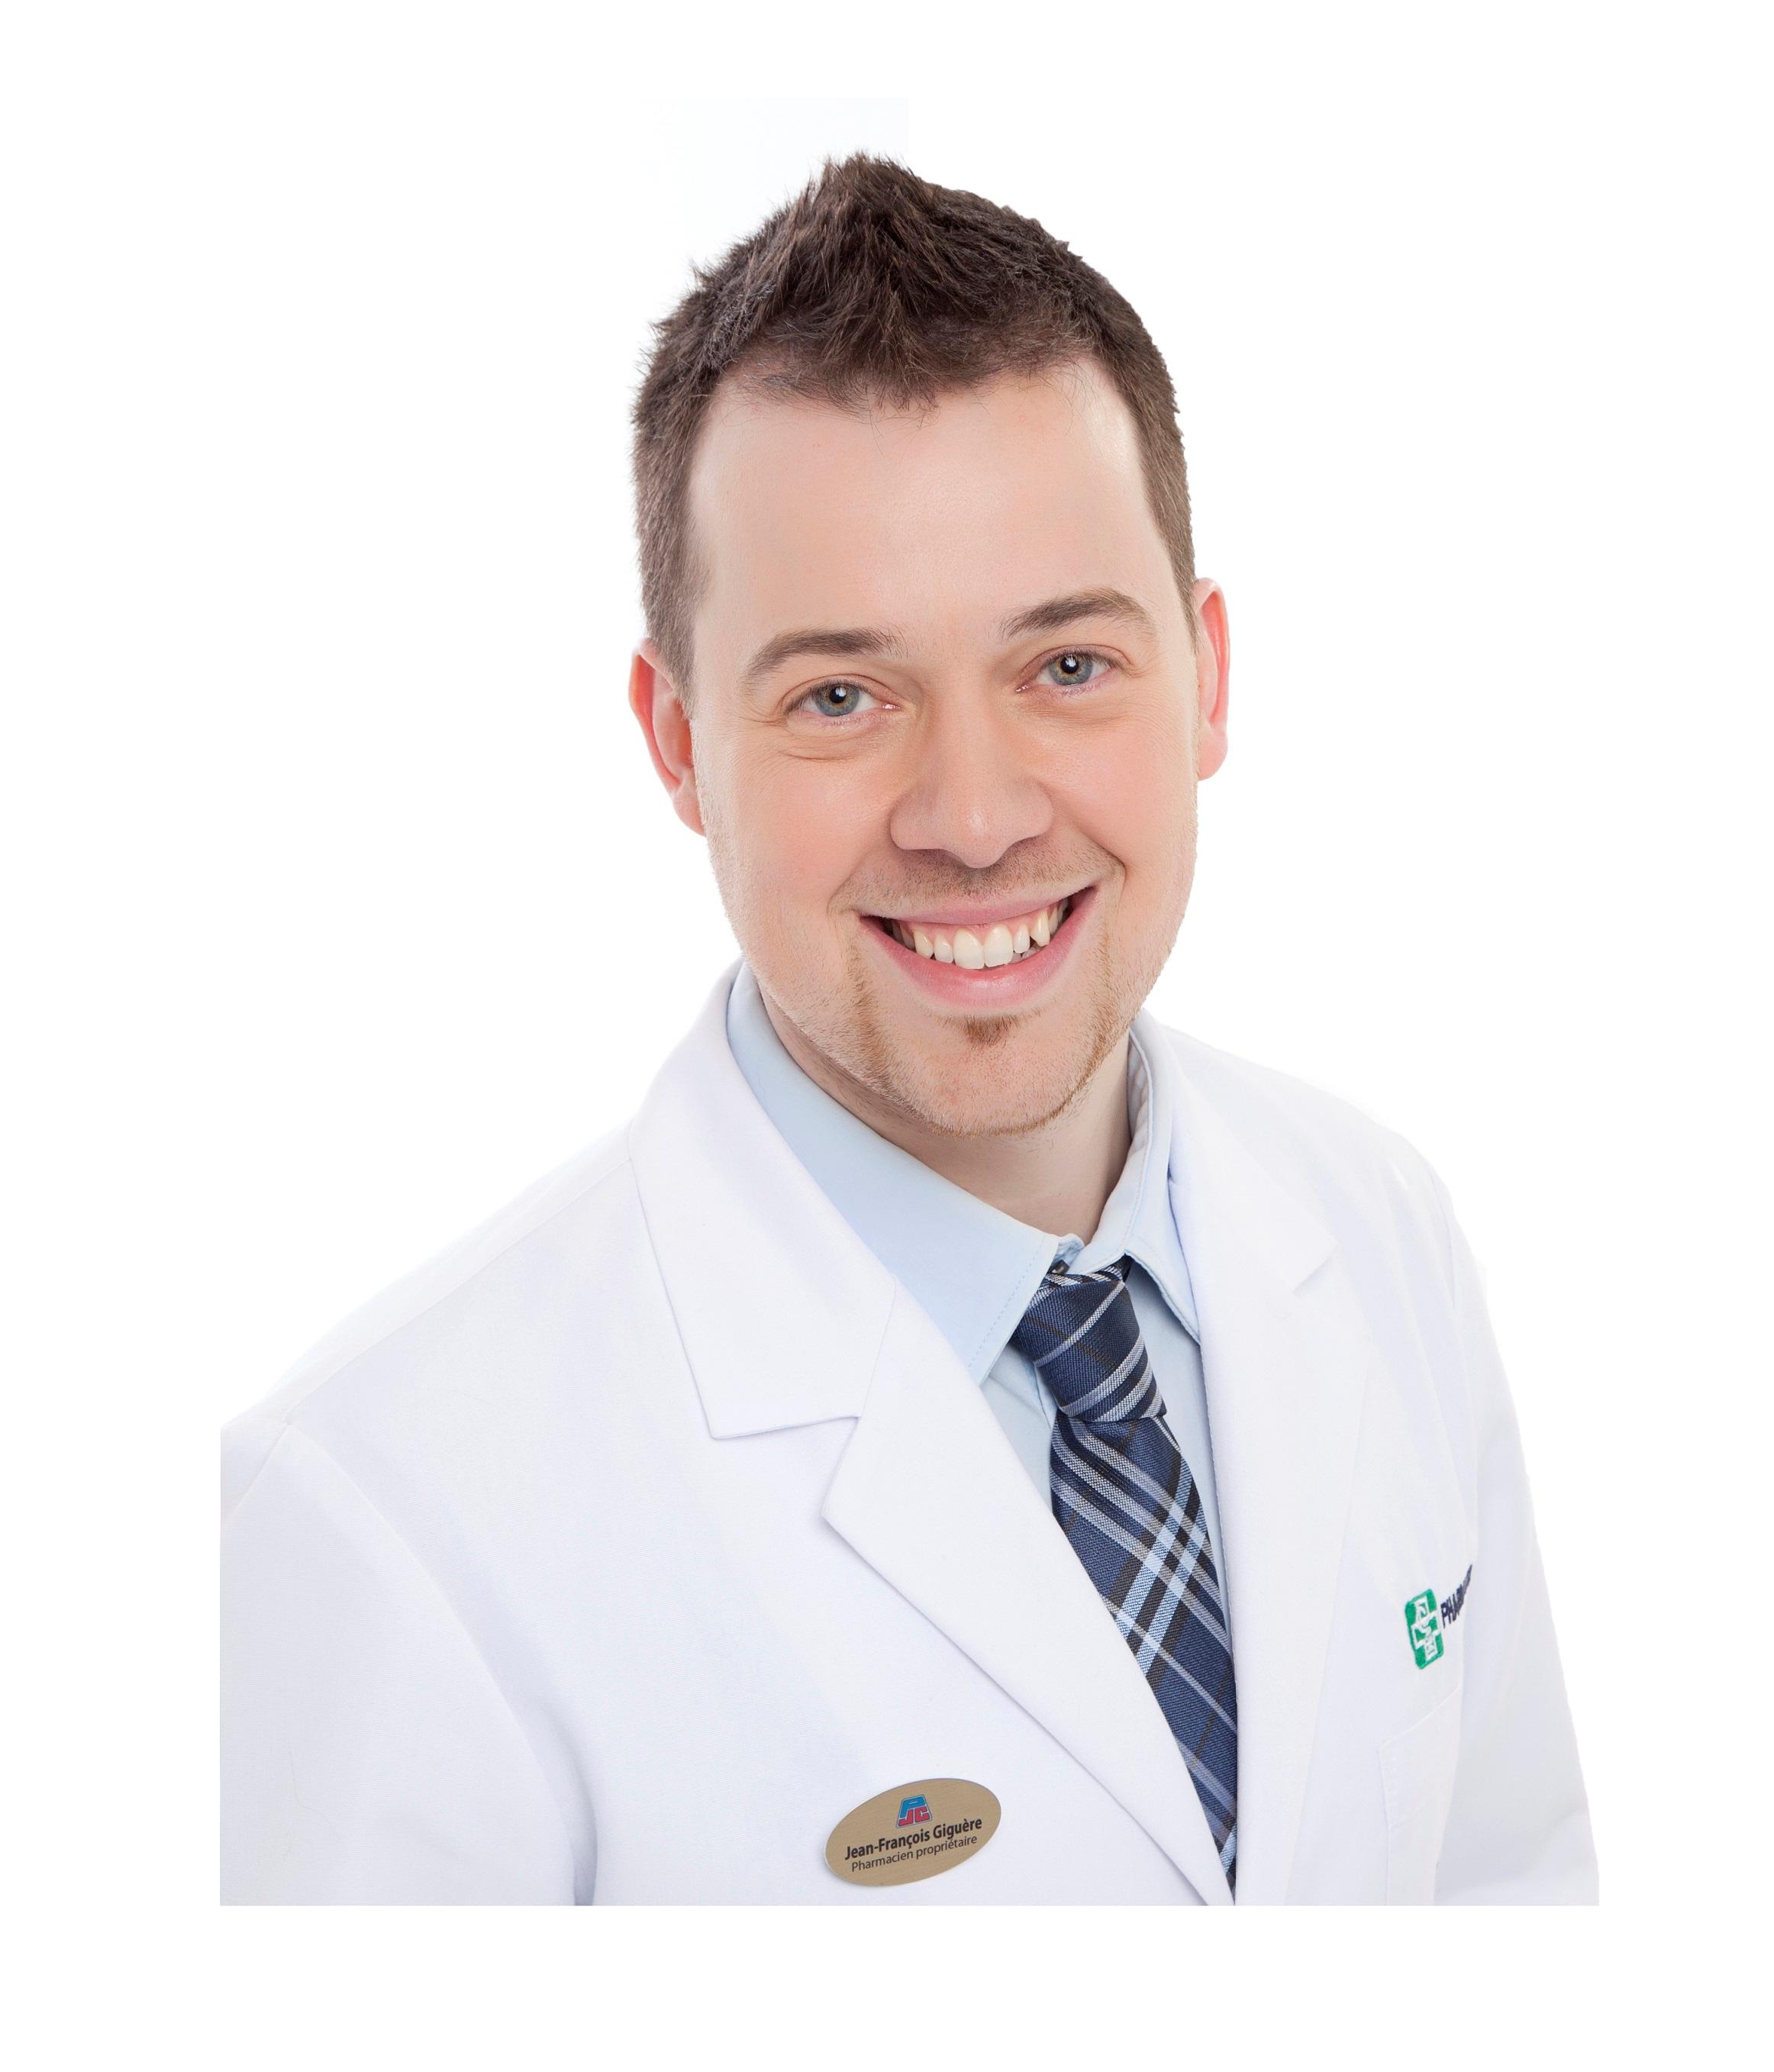 Jean-françois Giguère, Pharmacist